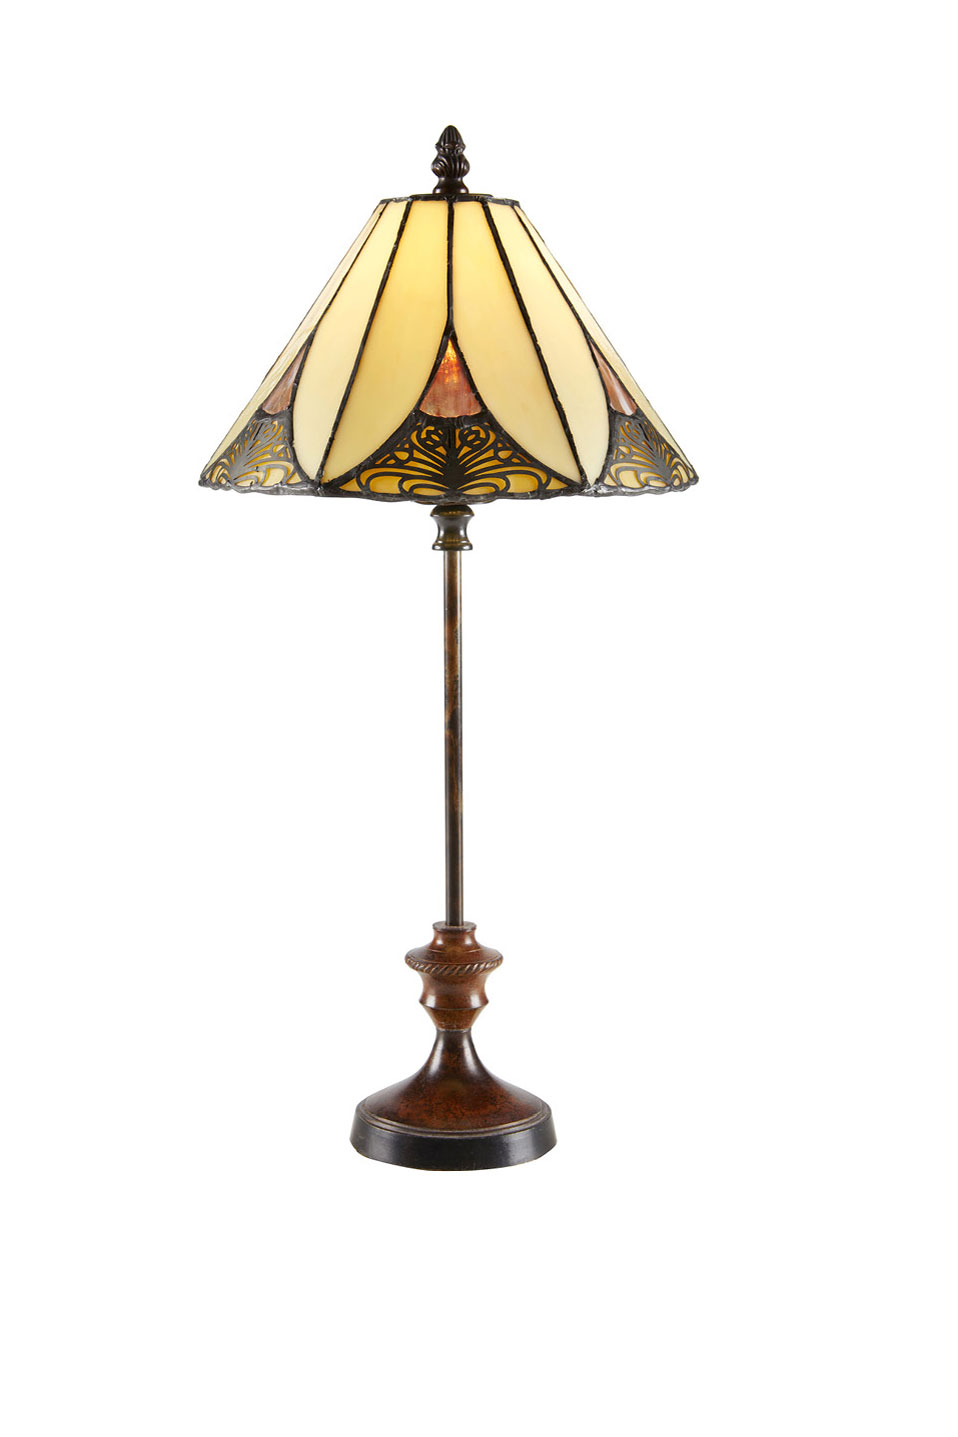 petite lampe art d co tiffany par artistar r f 18020075. Black Bedroom Furniture Sets. Home Design Ideas